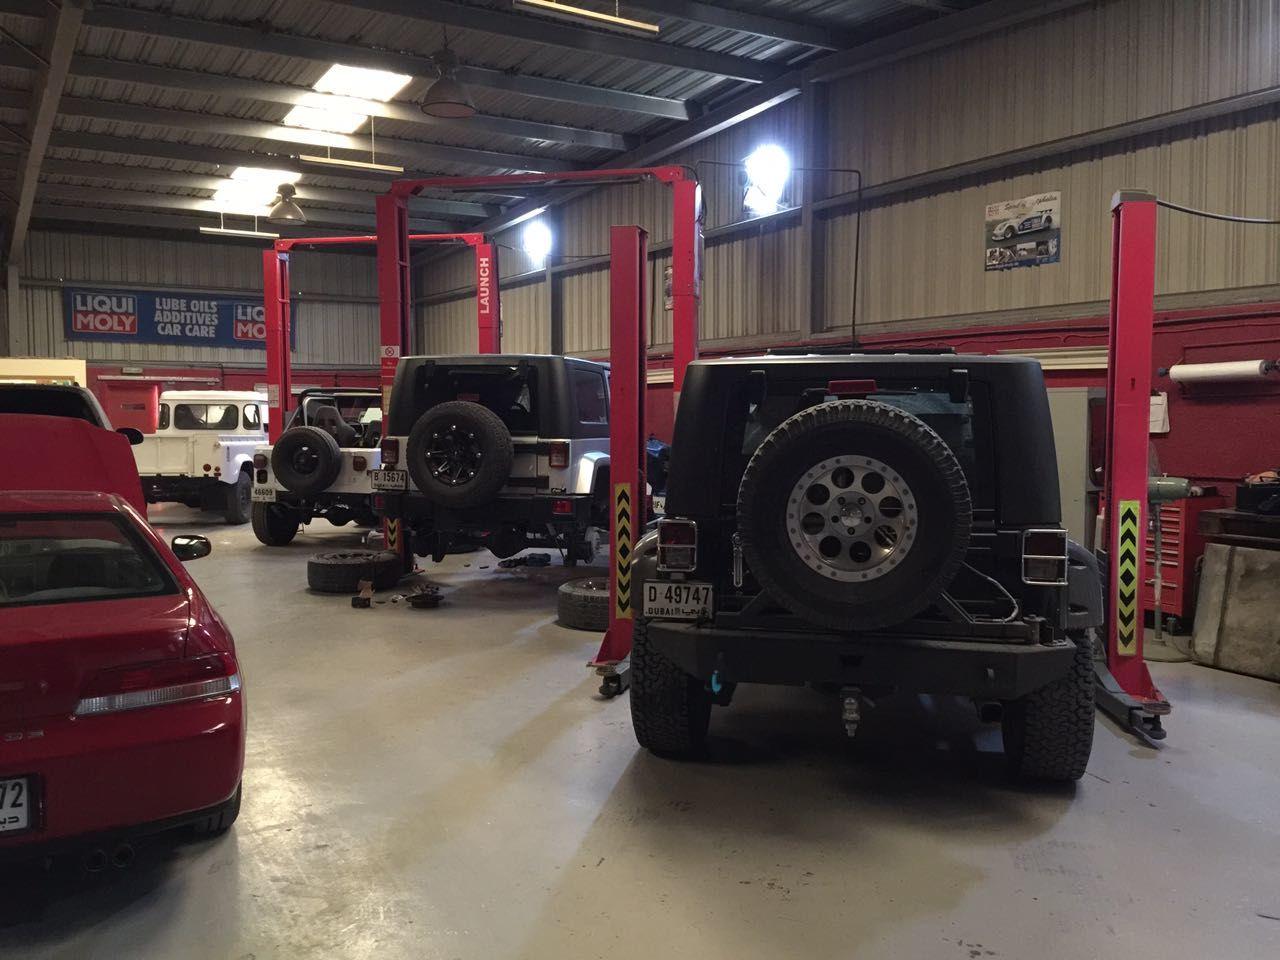 Al Qouz Industrial 3 Car Garage With Paint Room 3 800 Sq